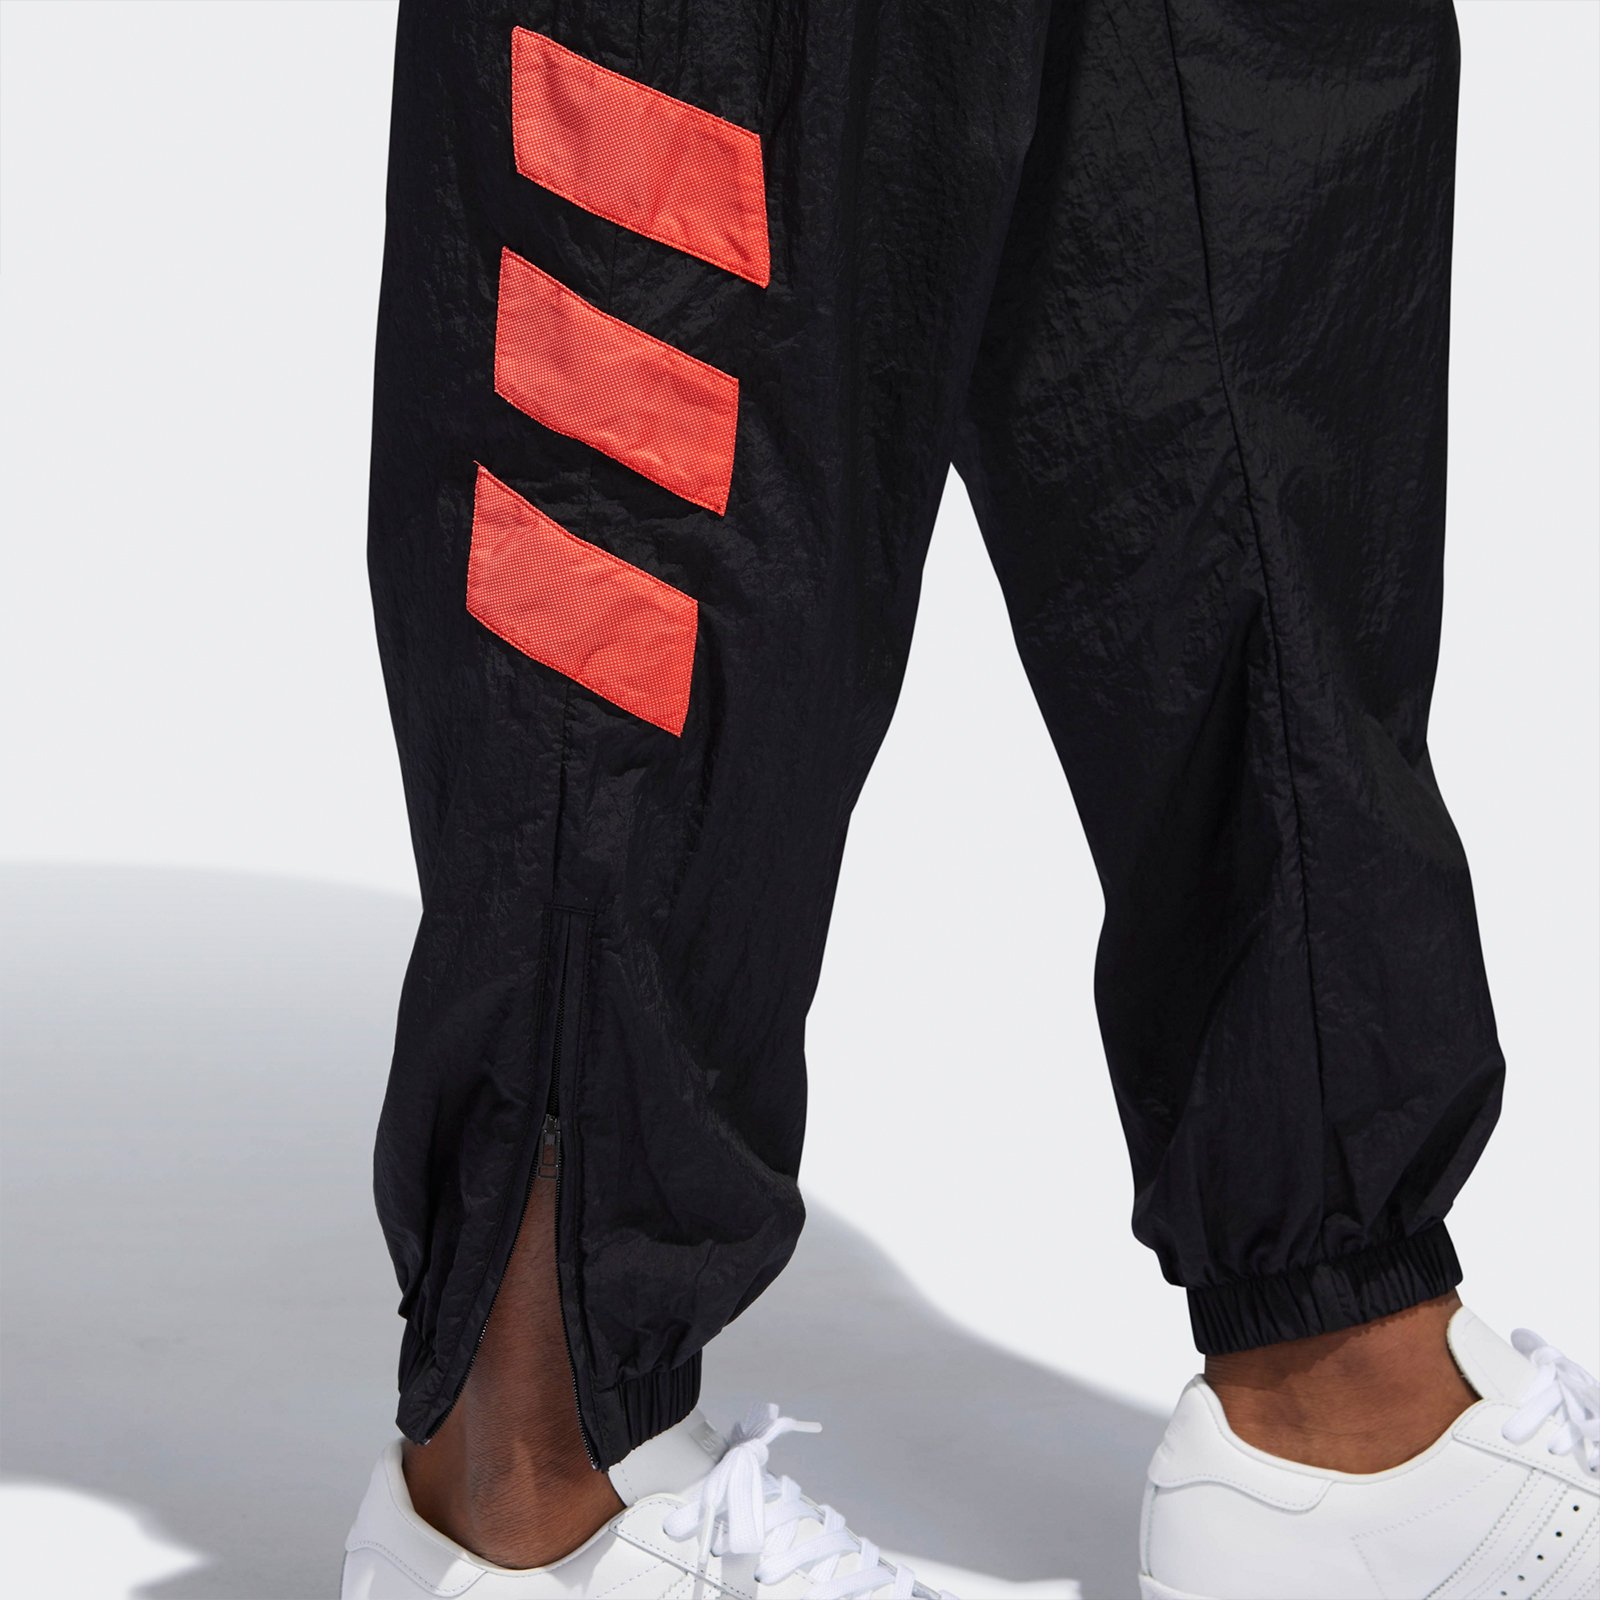 adidas Tironti Wind Pant Cw4989 Sneakersnstuff